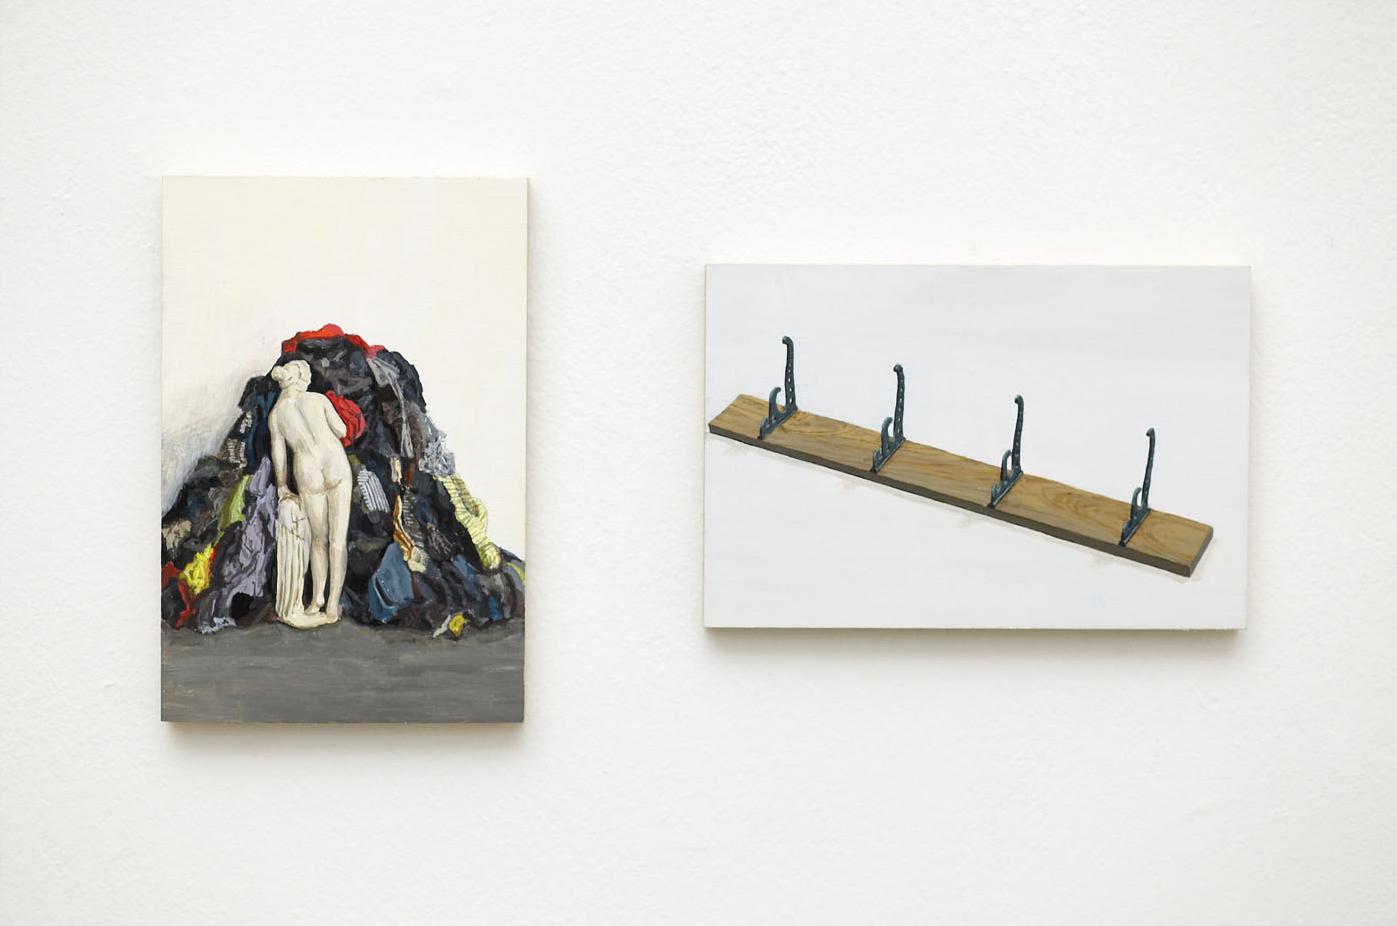 MICHELANGELO + MARCEL Acrylic on Plywood 2 Panels Each 10 x 15 cm